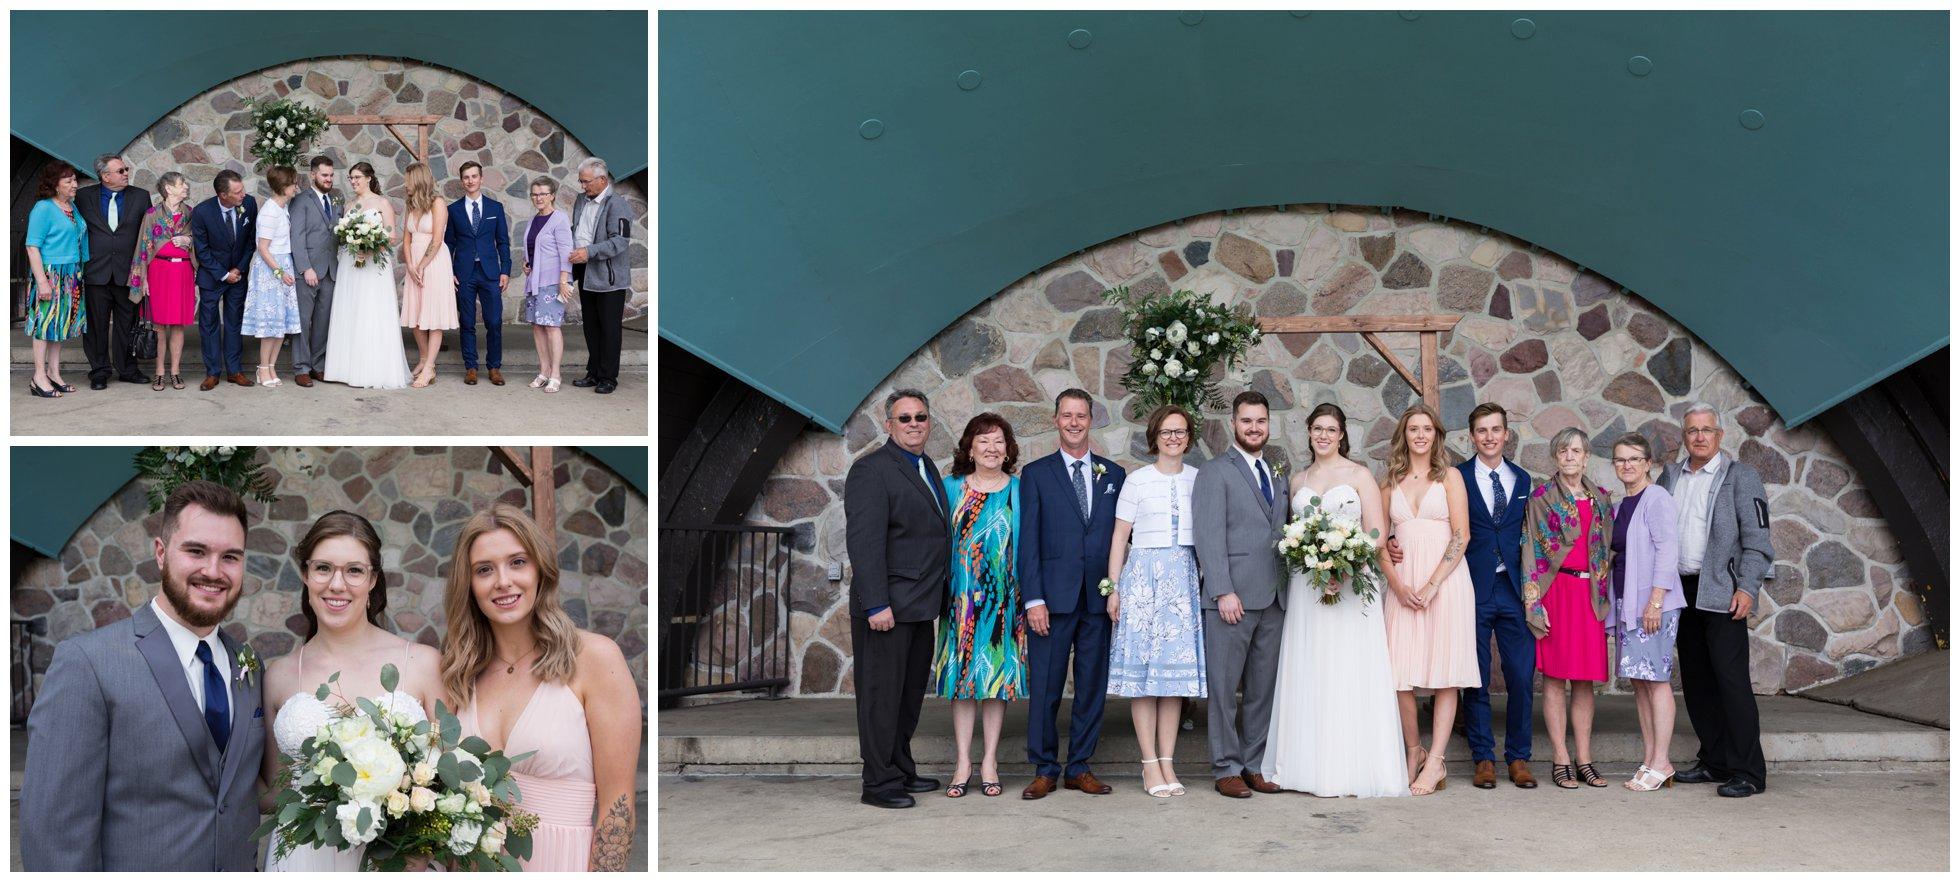 Emily and Royden Edmonton Wedding (Life by Selena Photography)_0021.jpg